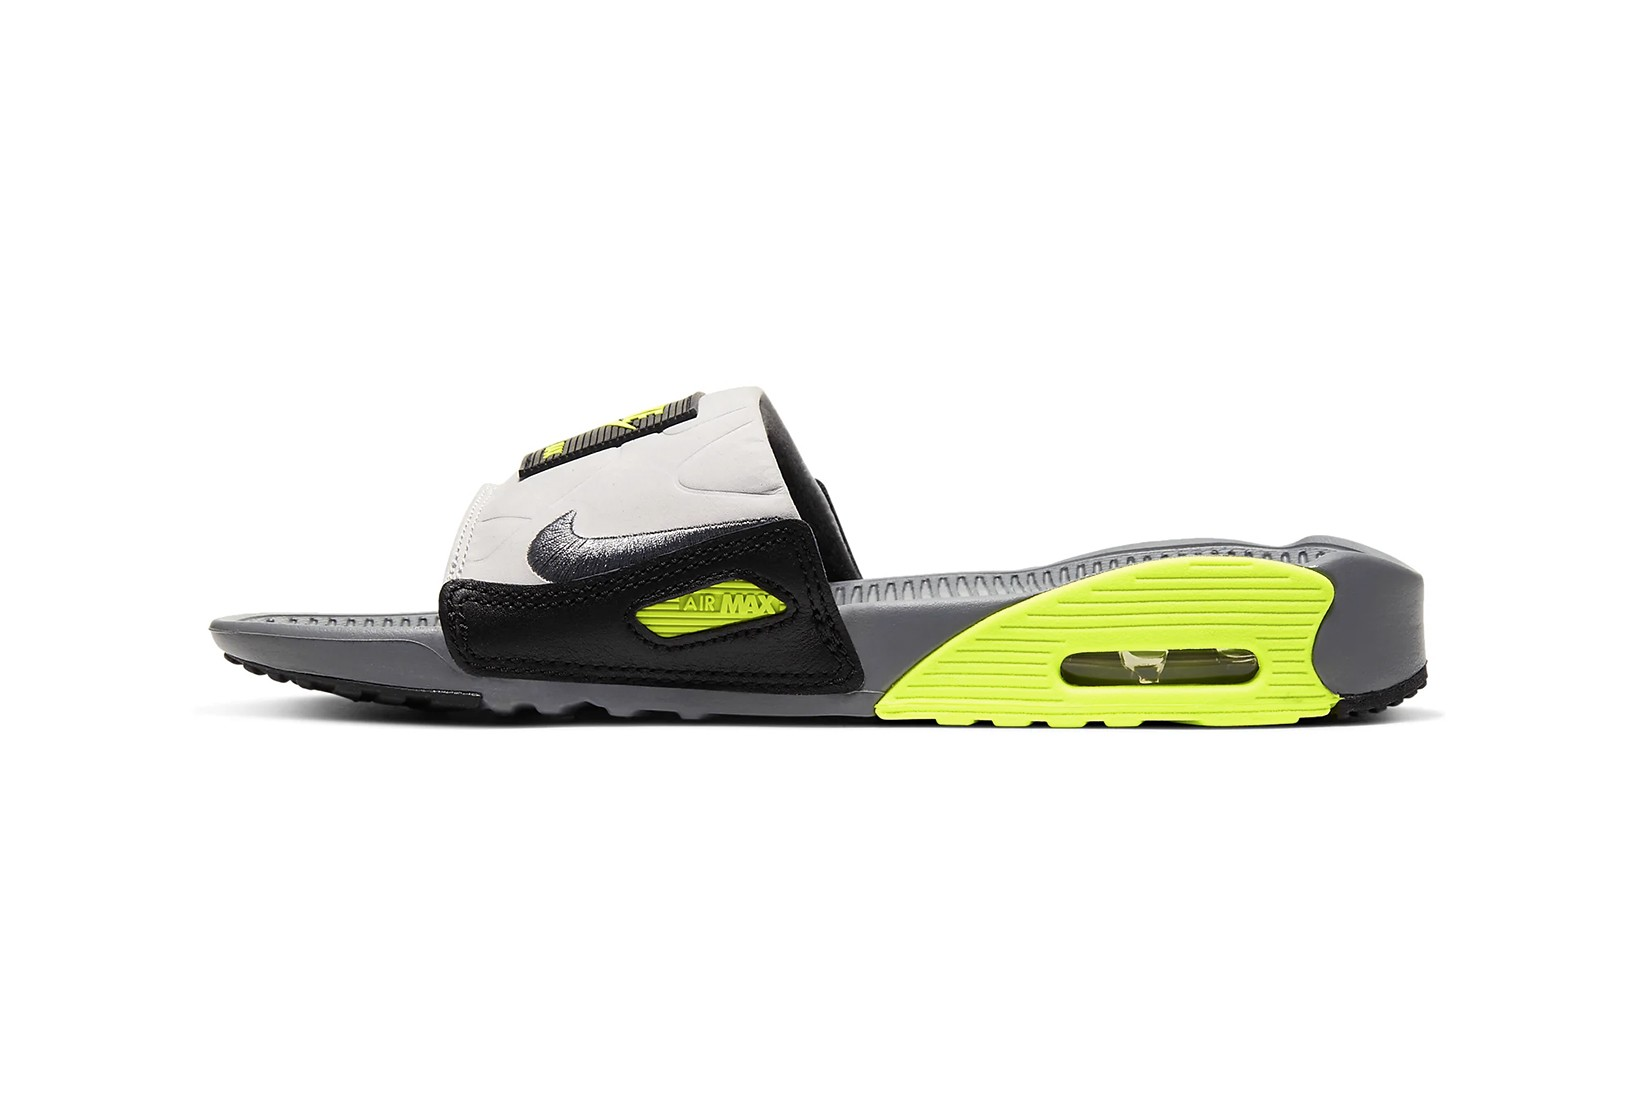 Nike Air Max 90 Women's Slide in Neon